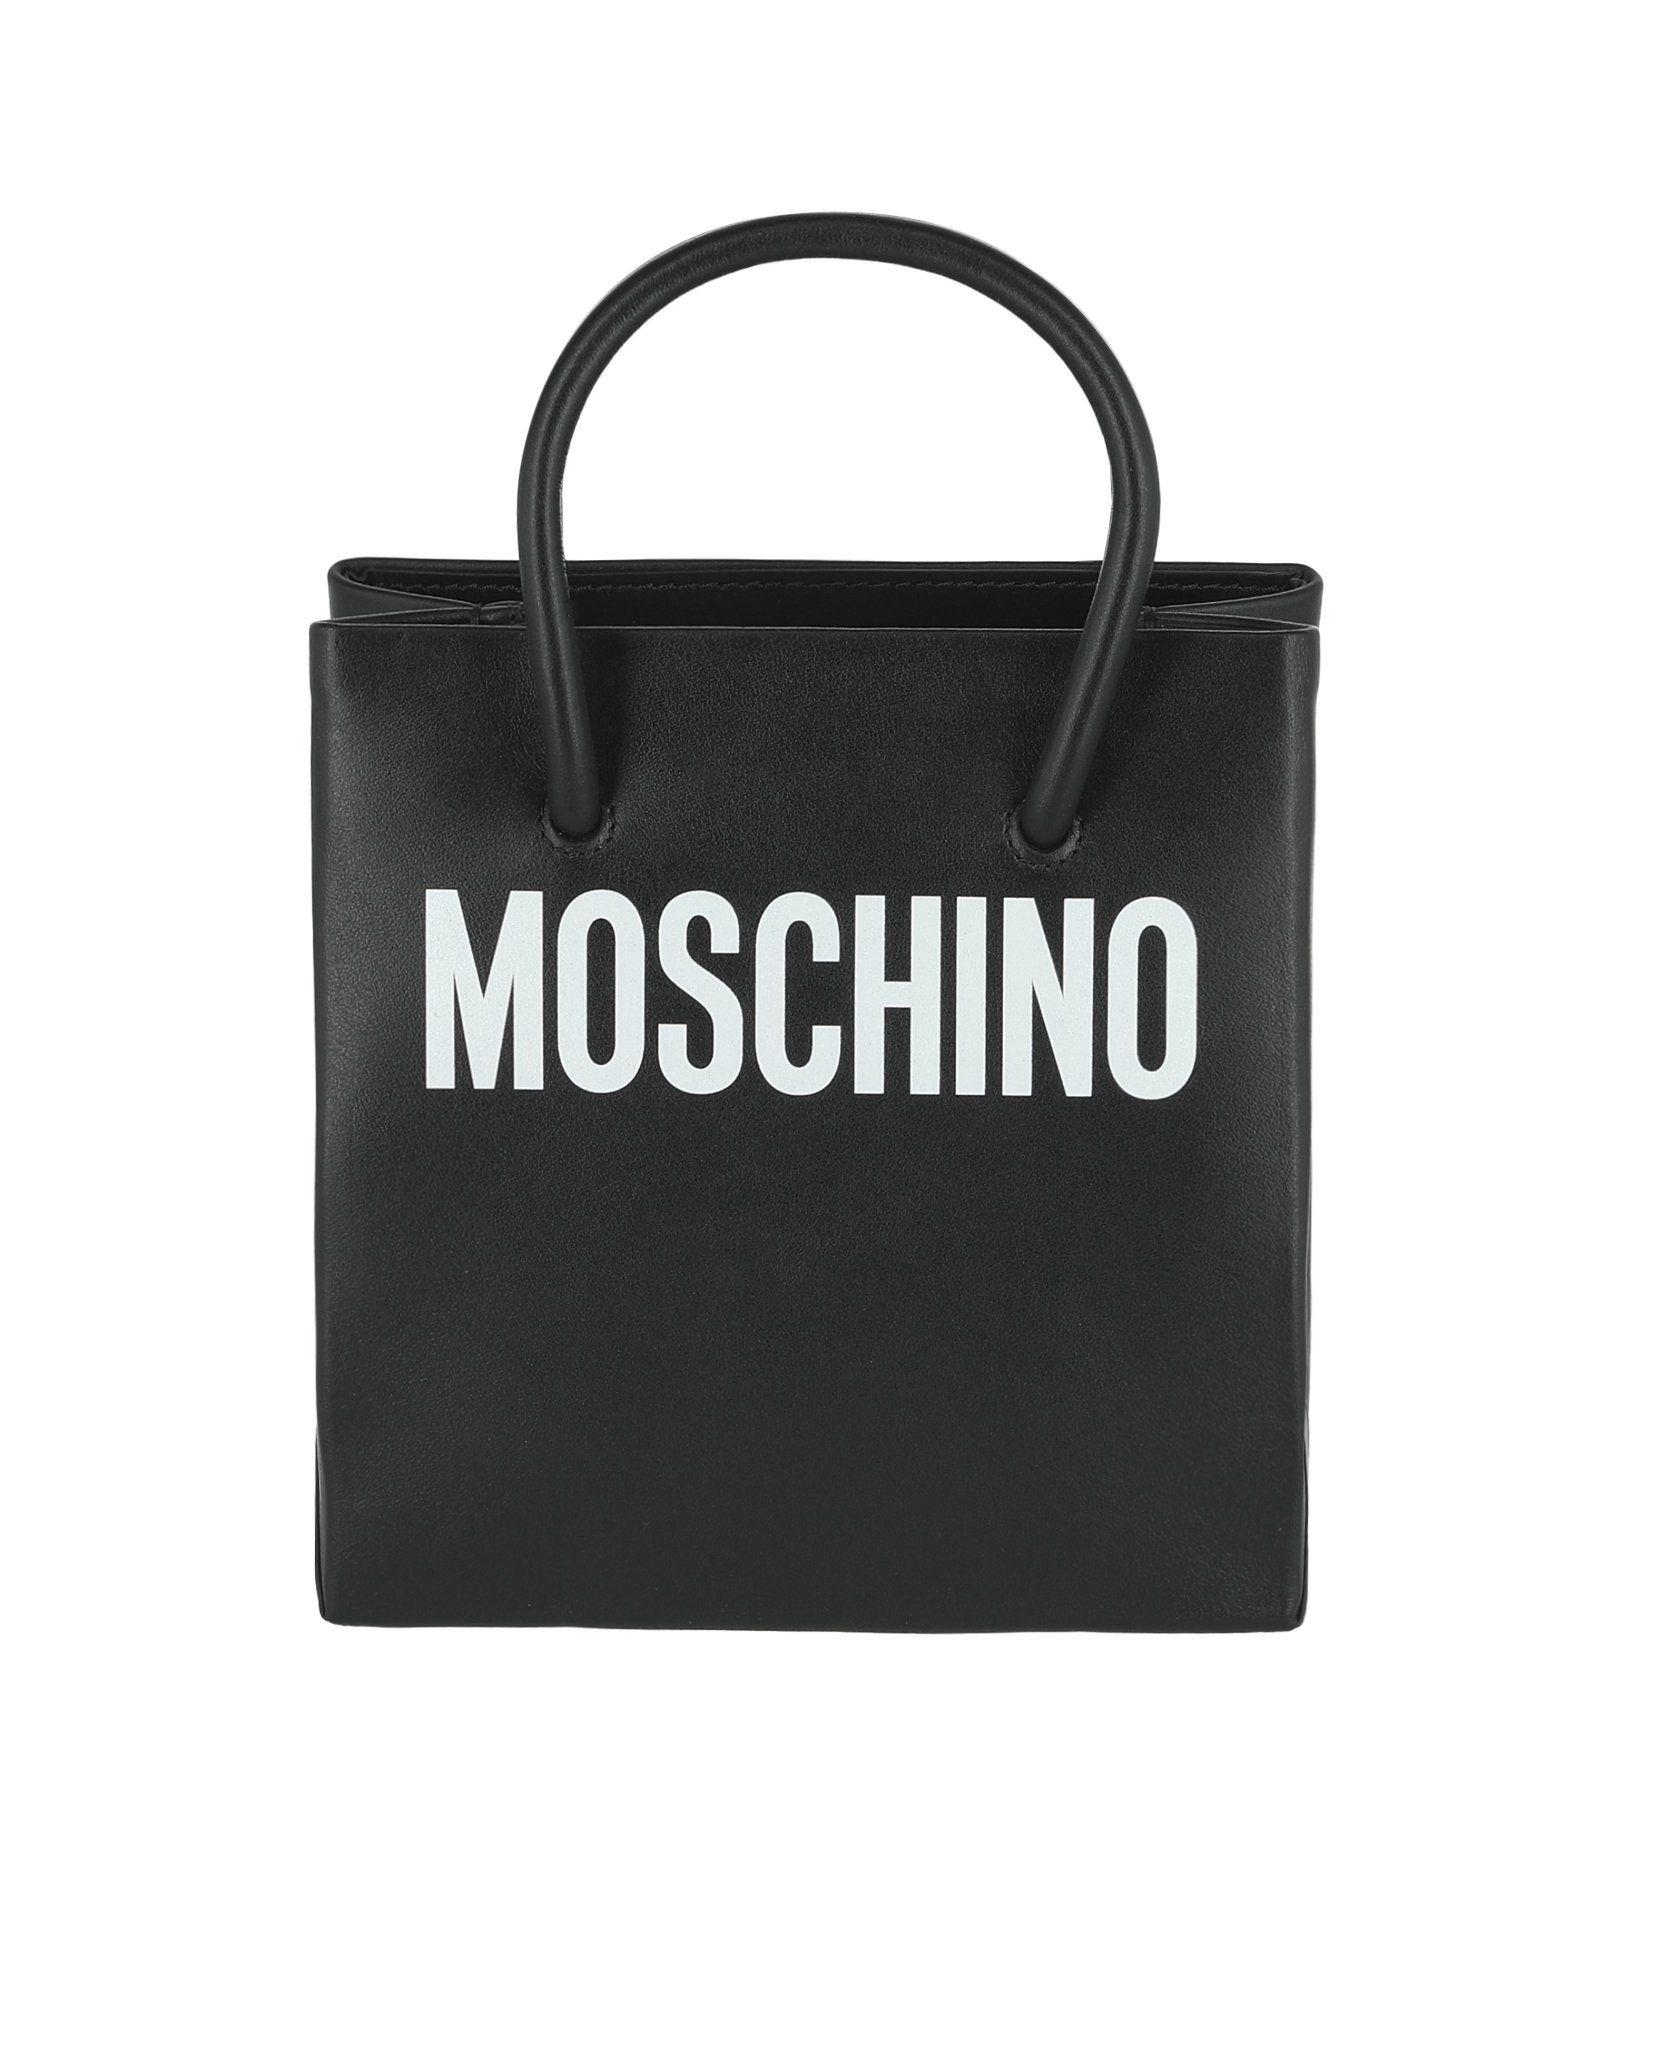 Moschino Logo Print Leather Tote Bag  a2d5a9f4858e0